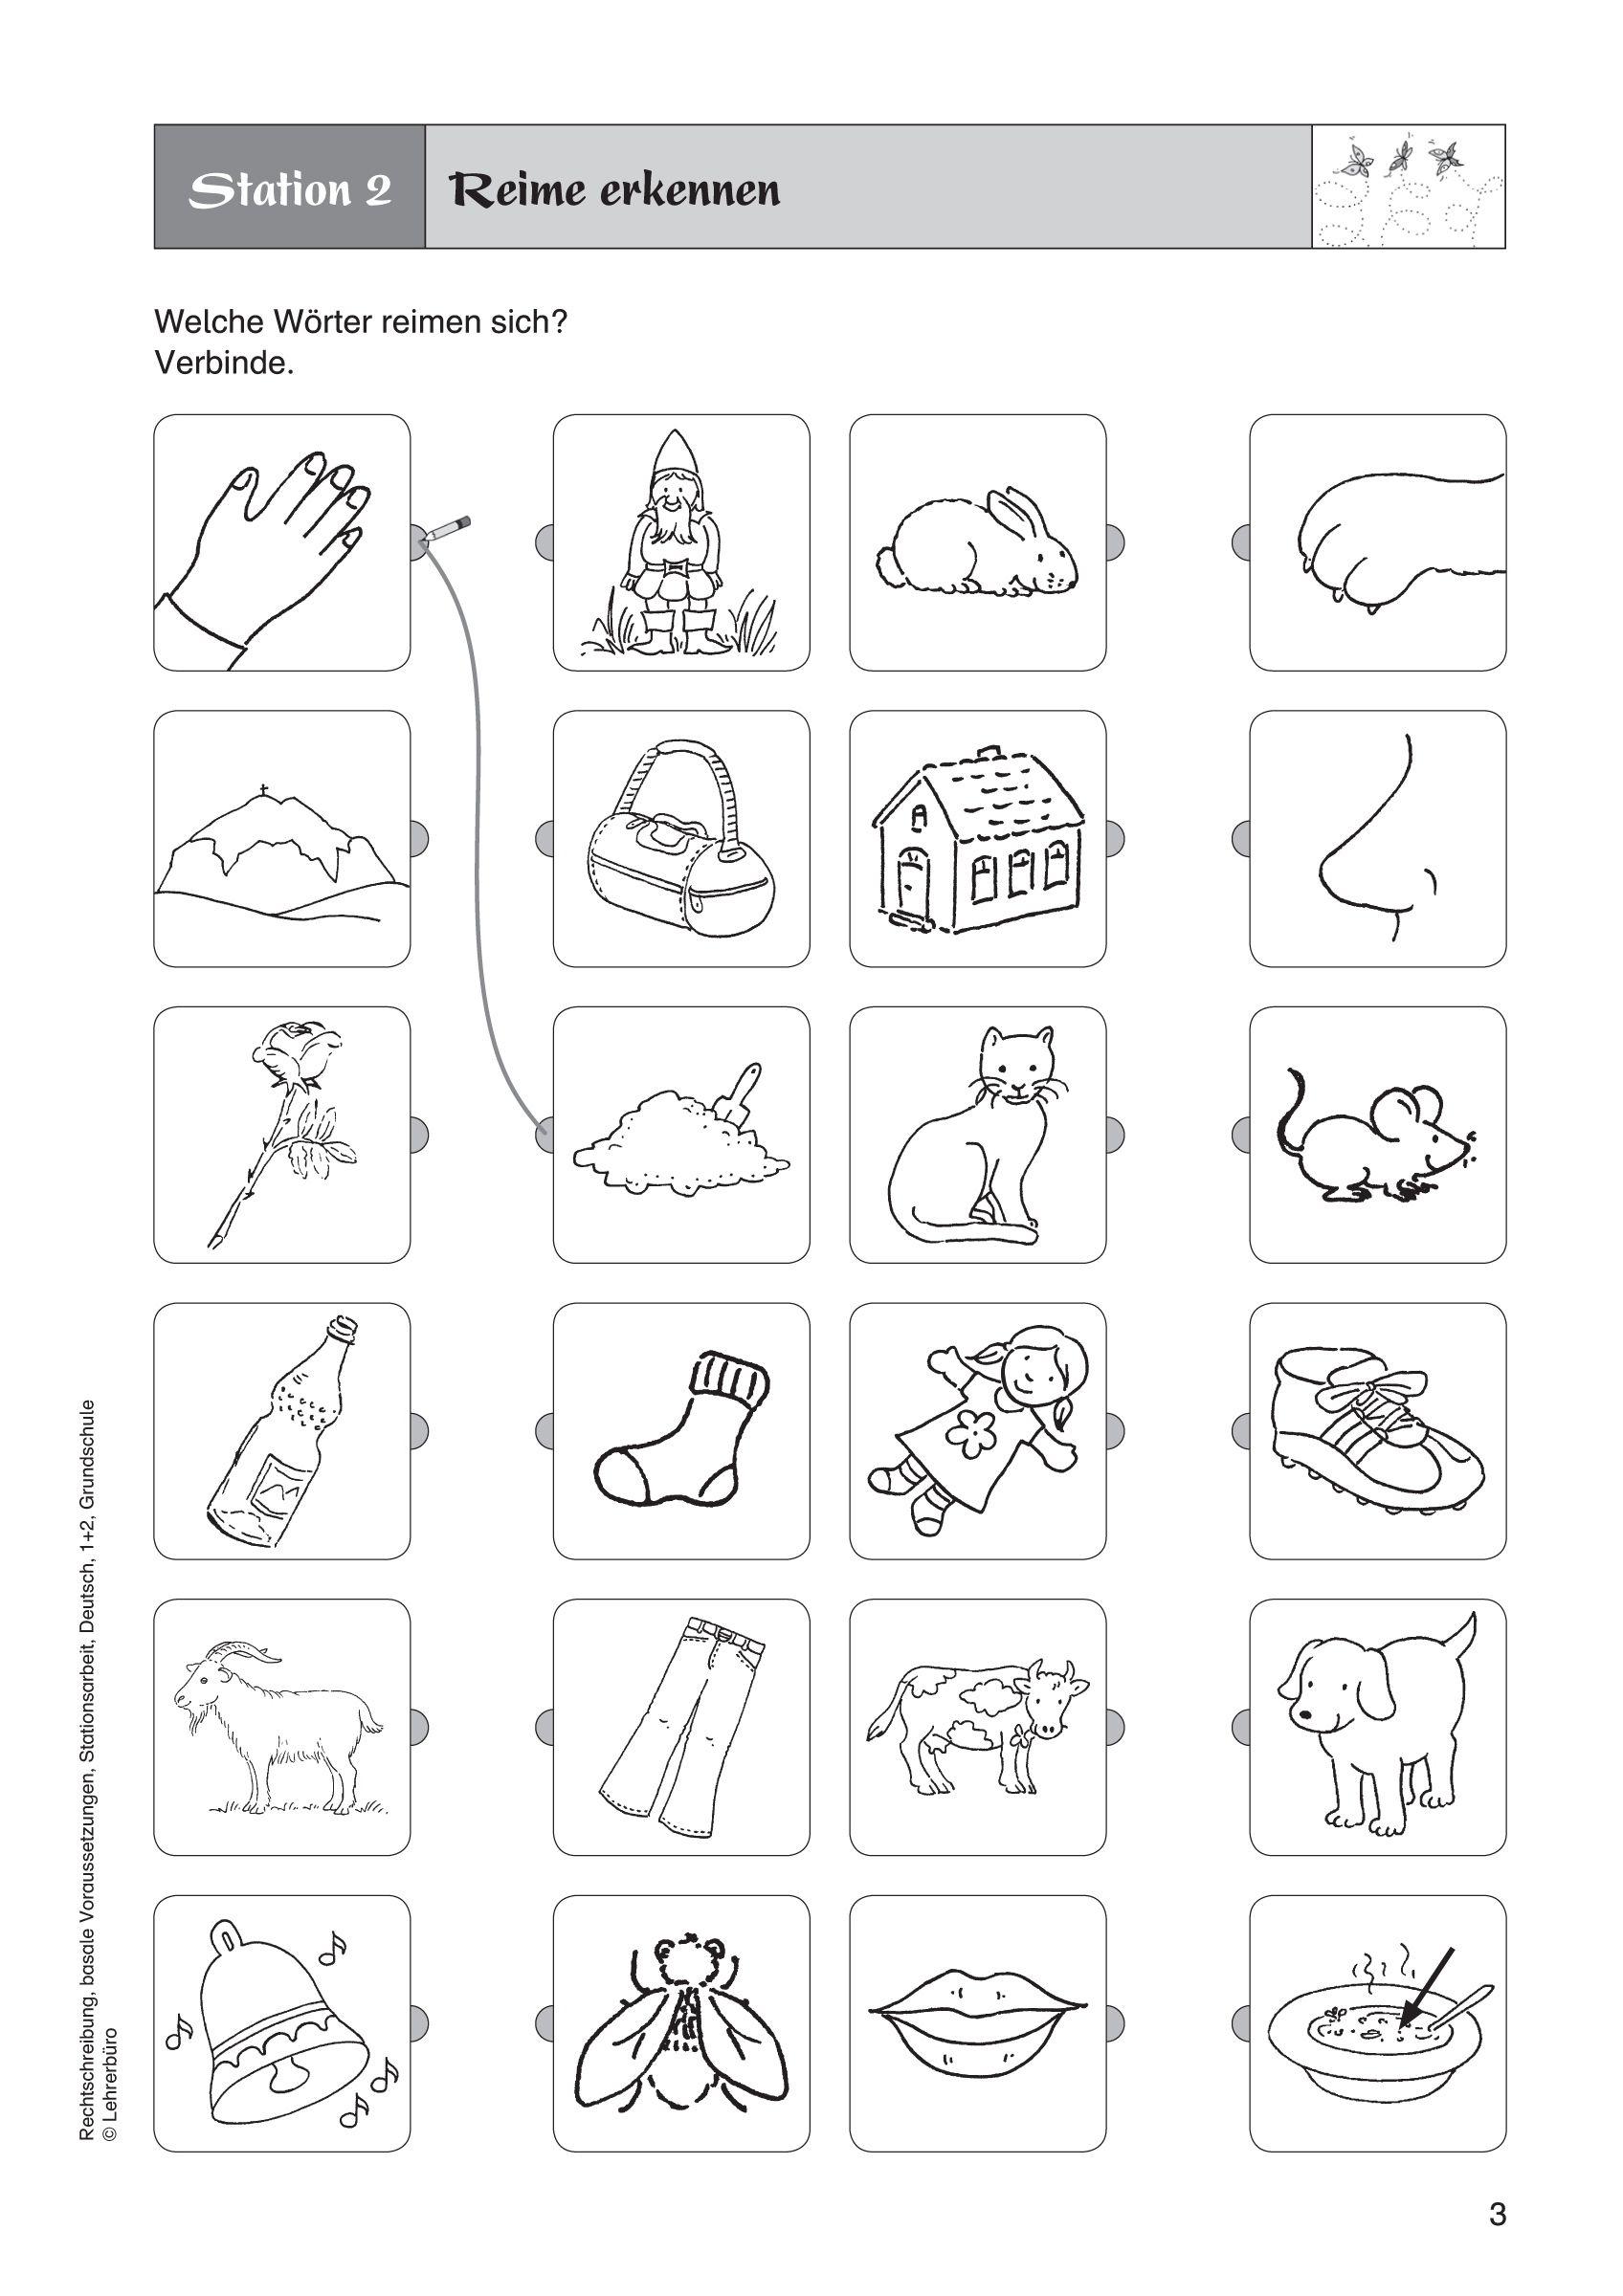 Arbeitsblätter Grundschule 1 Klasse Ausdrucken 1 Klasse über 1 Klasse Arbeitsblätter Zum Ausdrucken